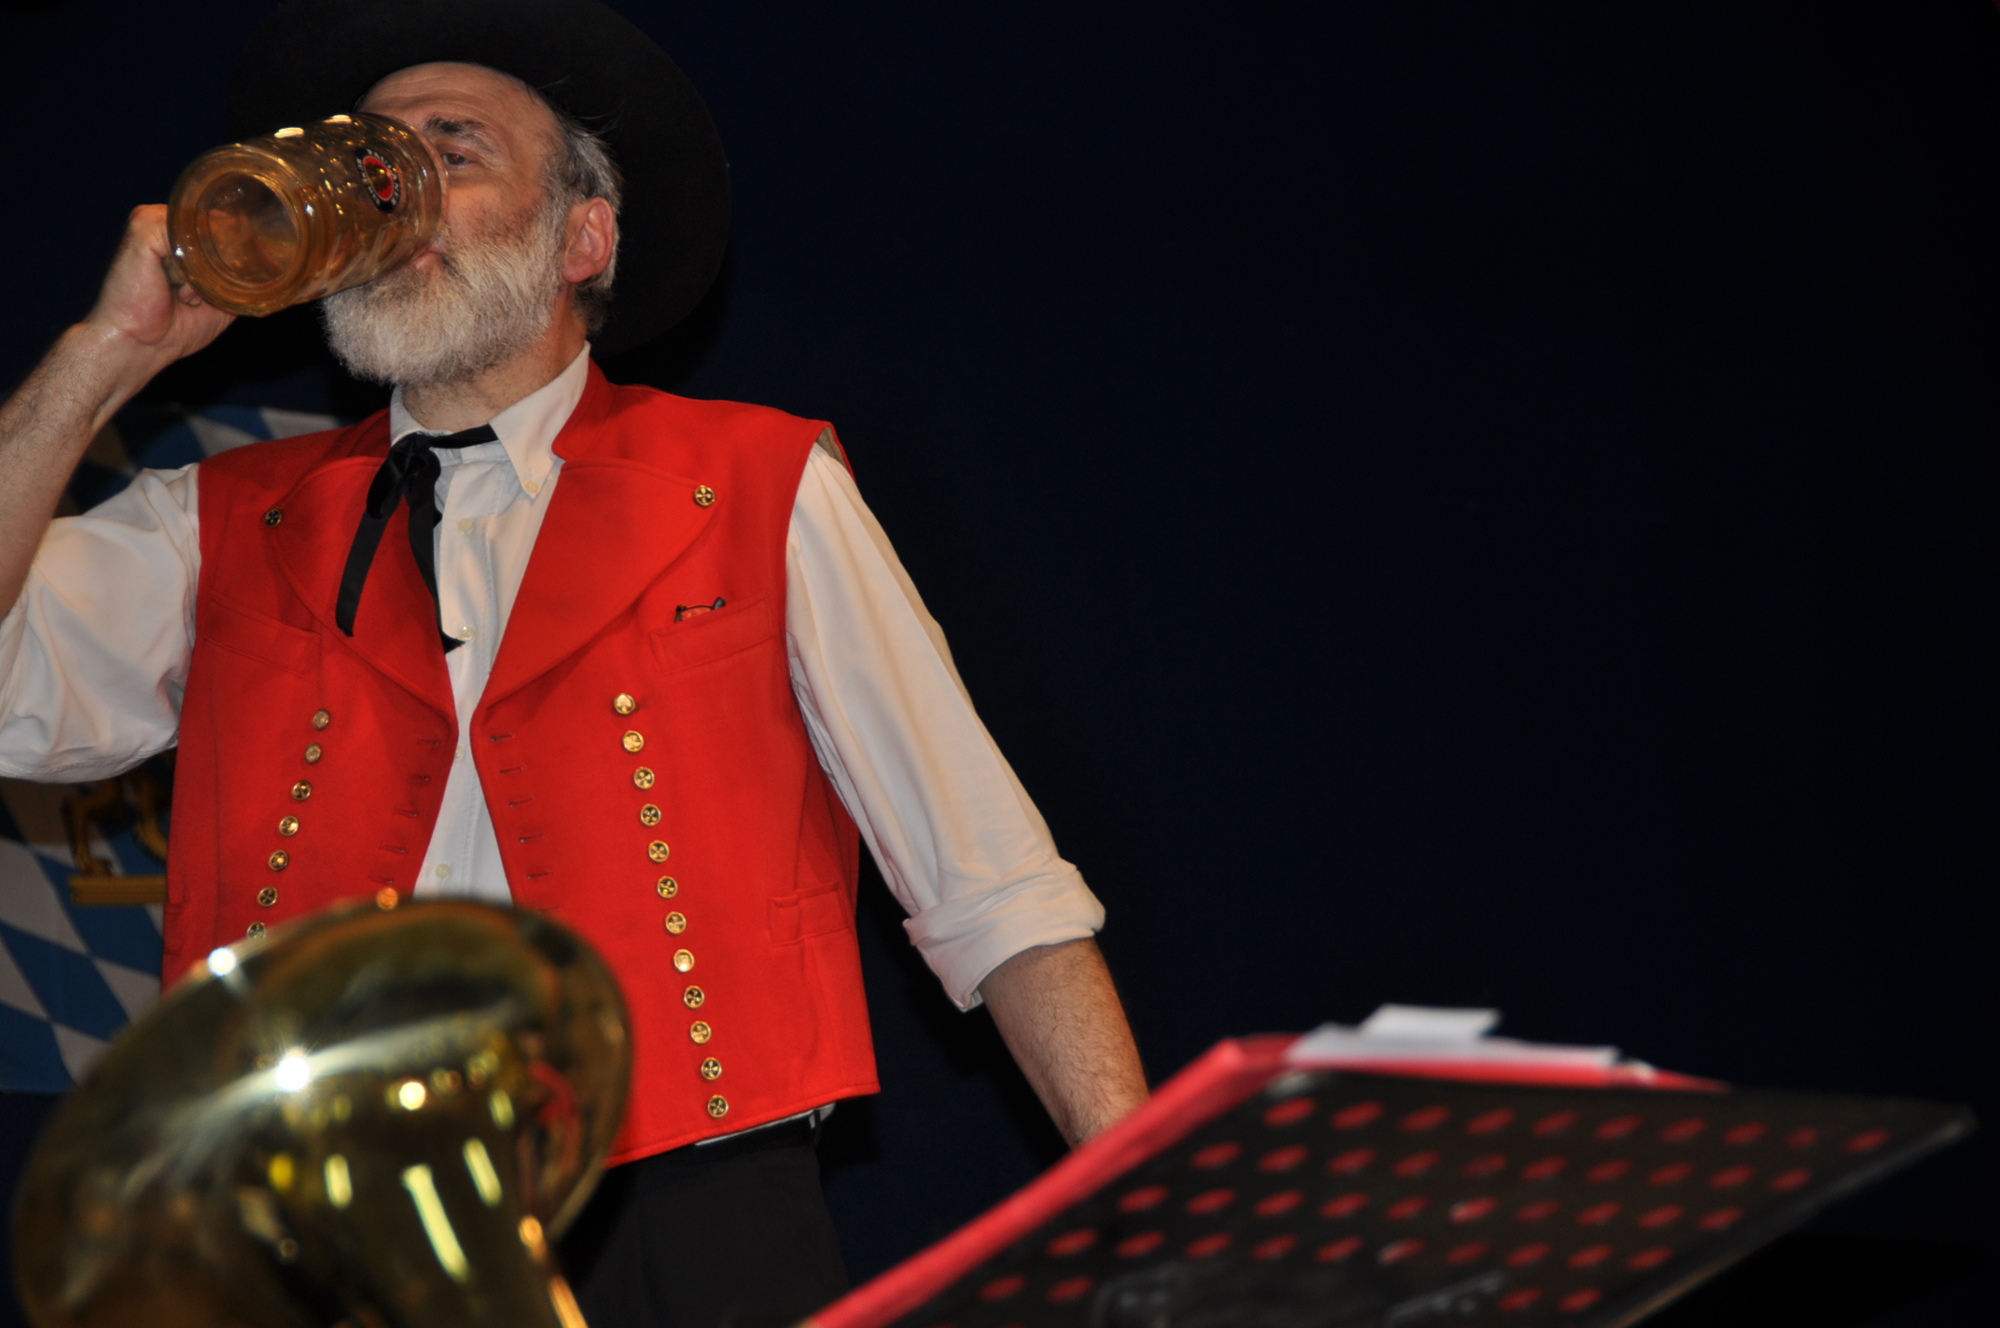 LA-CRAU-2011-Orchestre-alsacien-19